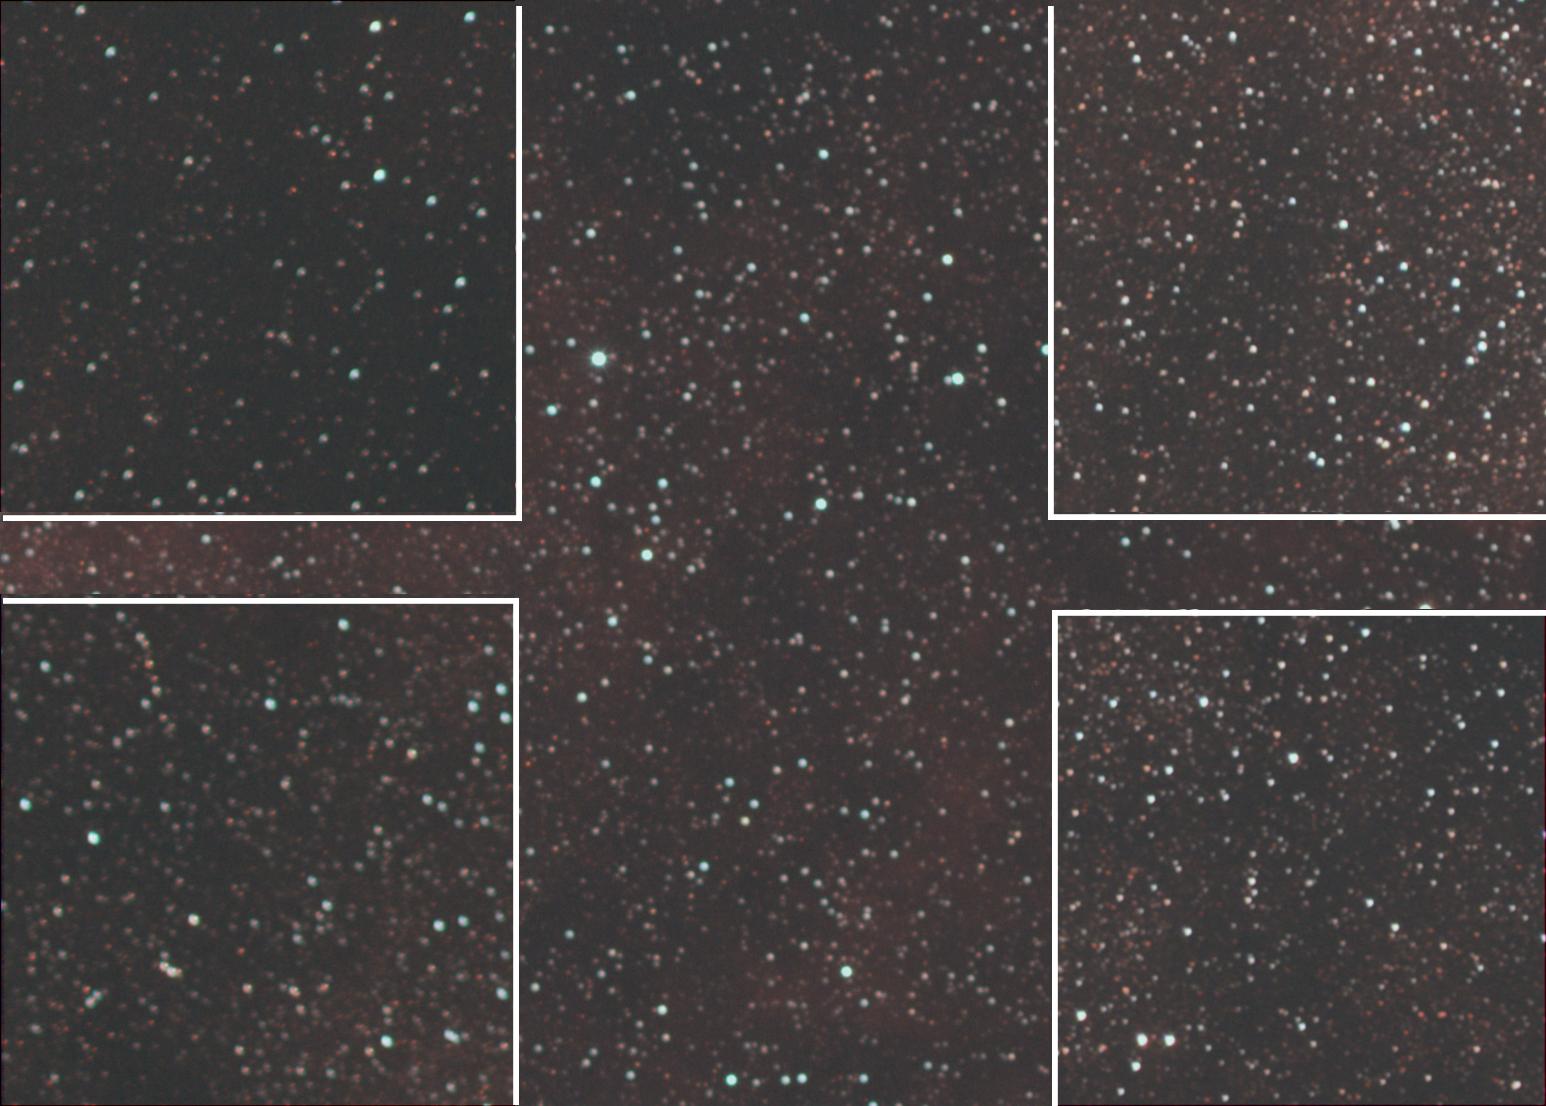 f:id:snct-astro:20180615132028j:plain